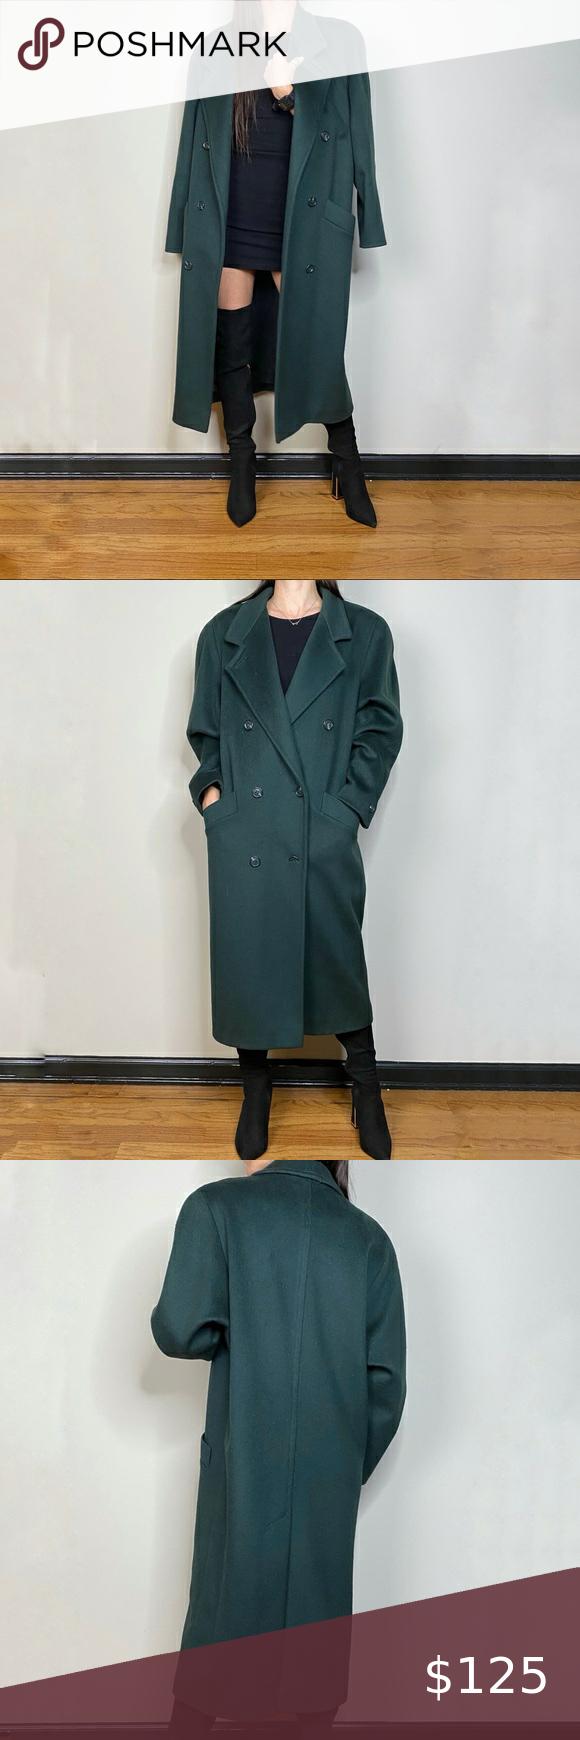 Stunning Wool jacket